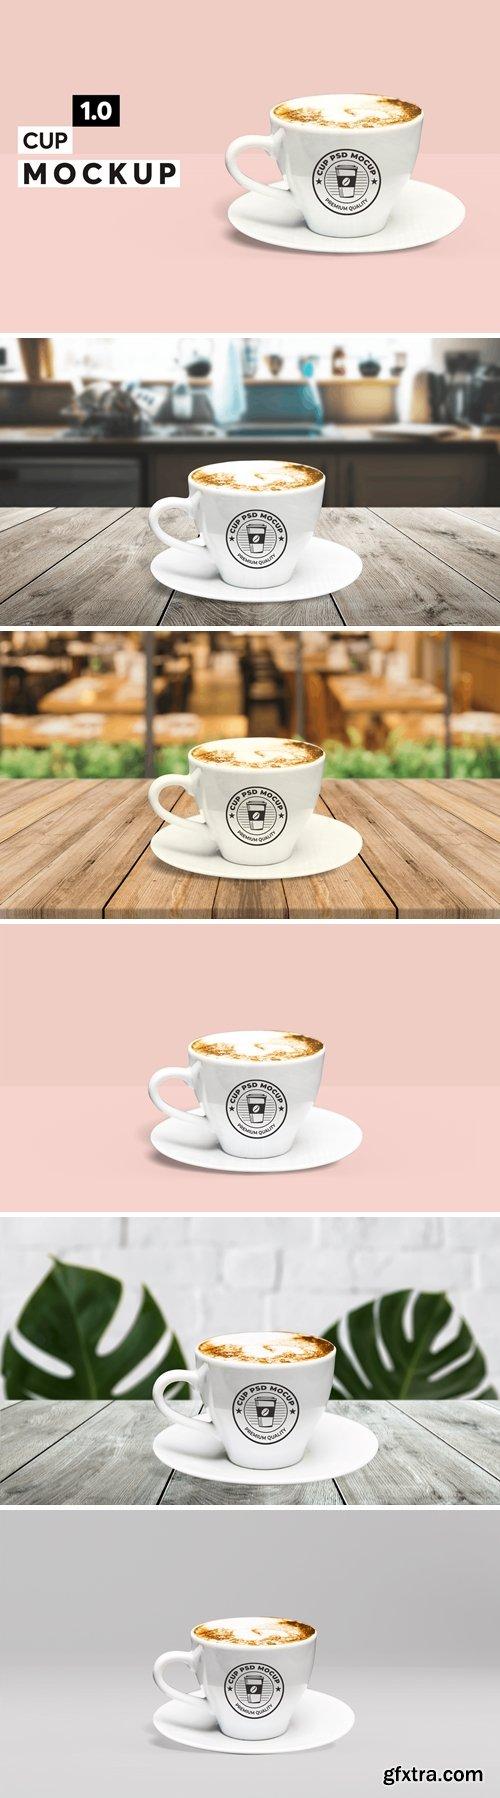 Cup Mockup 1.0